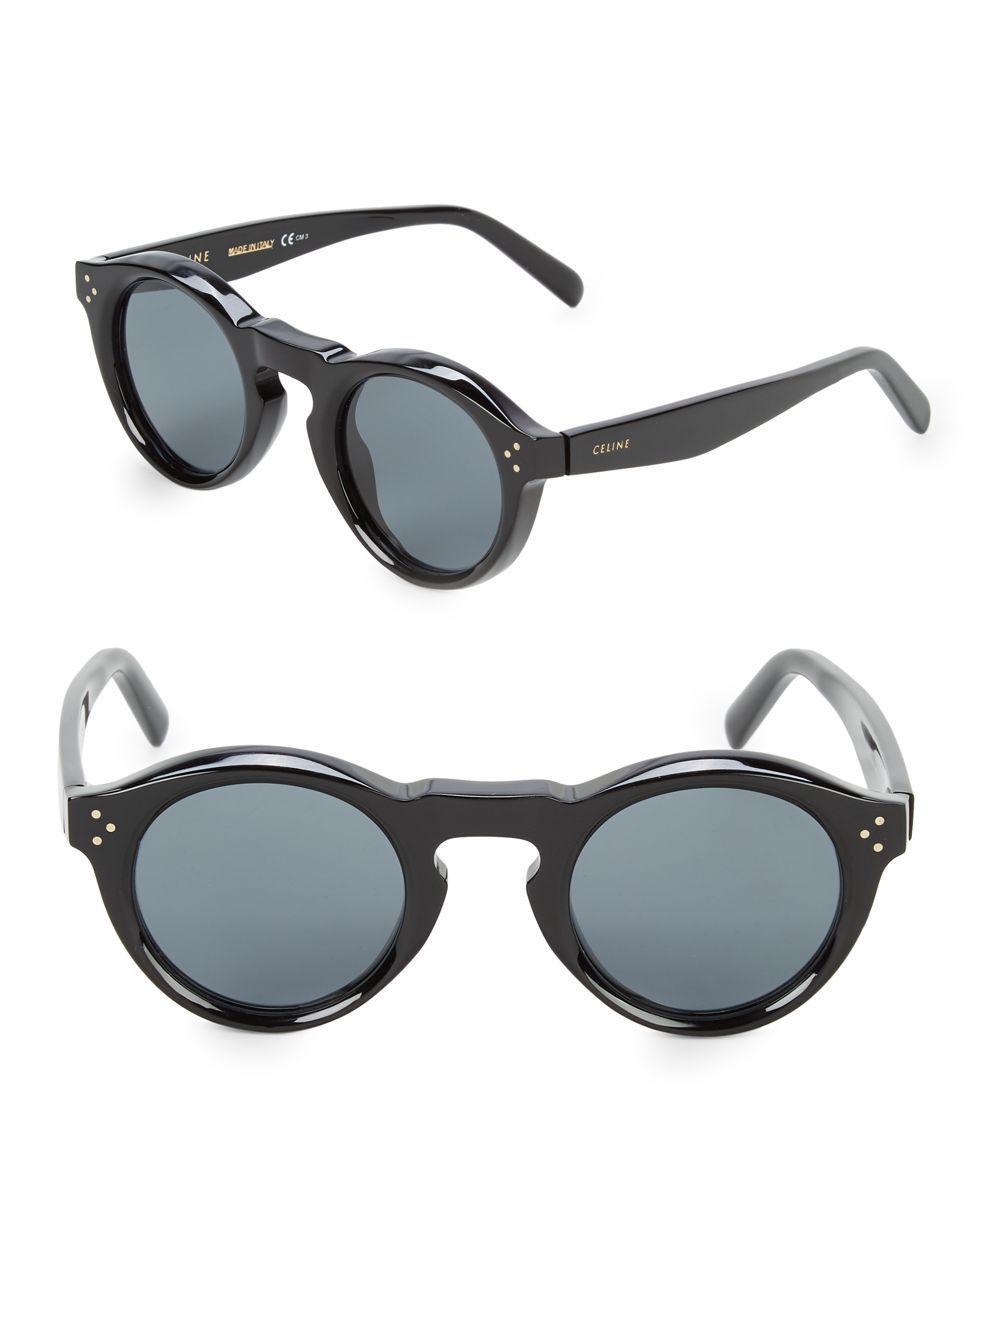 9f92d4374d6 Lyst - Céline 45mm Professor Round Sunglasses in Black